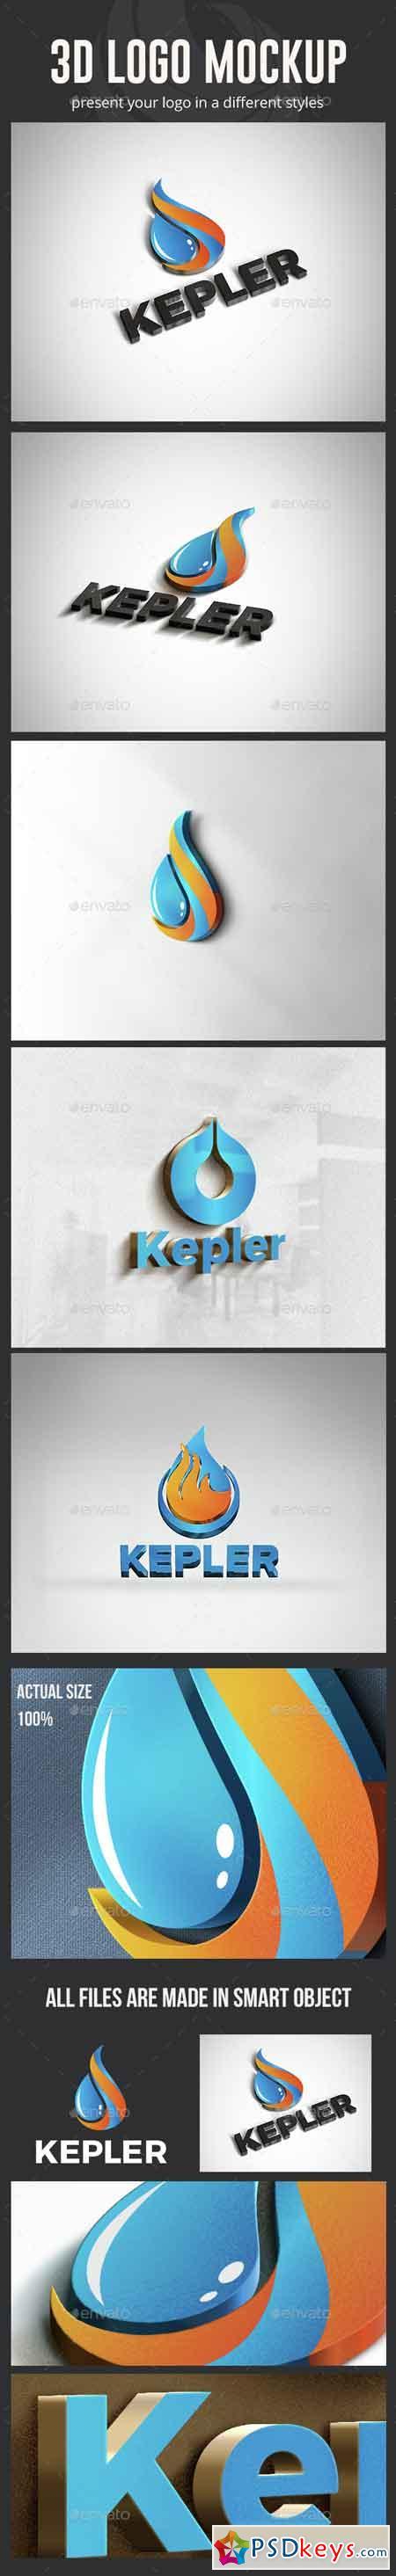 3D Logo Mockup 14769764 » Free Download Photoshop Vector